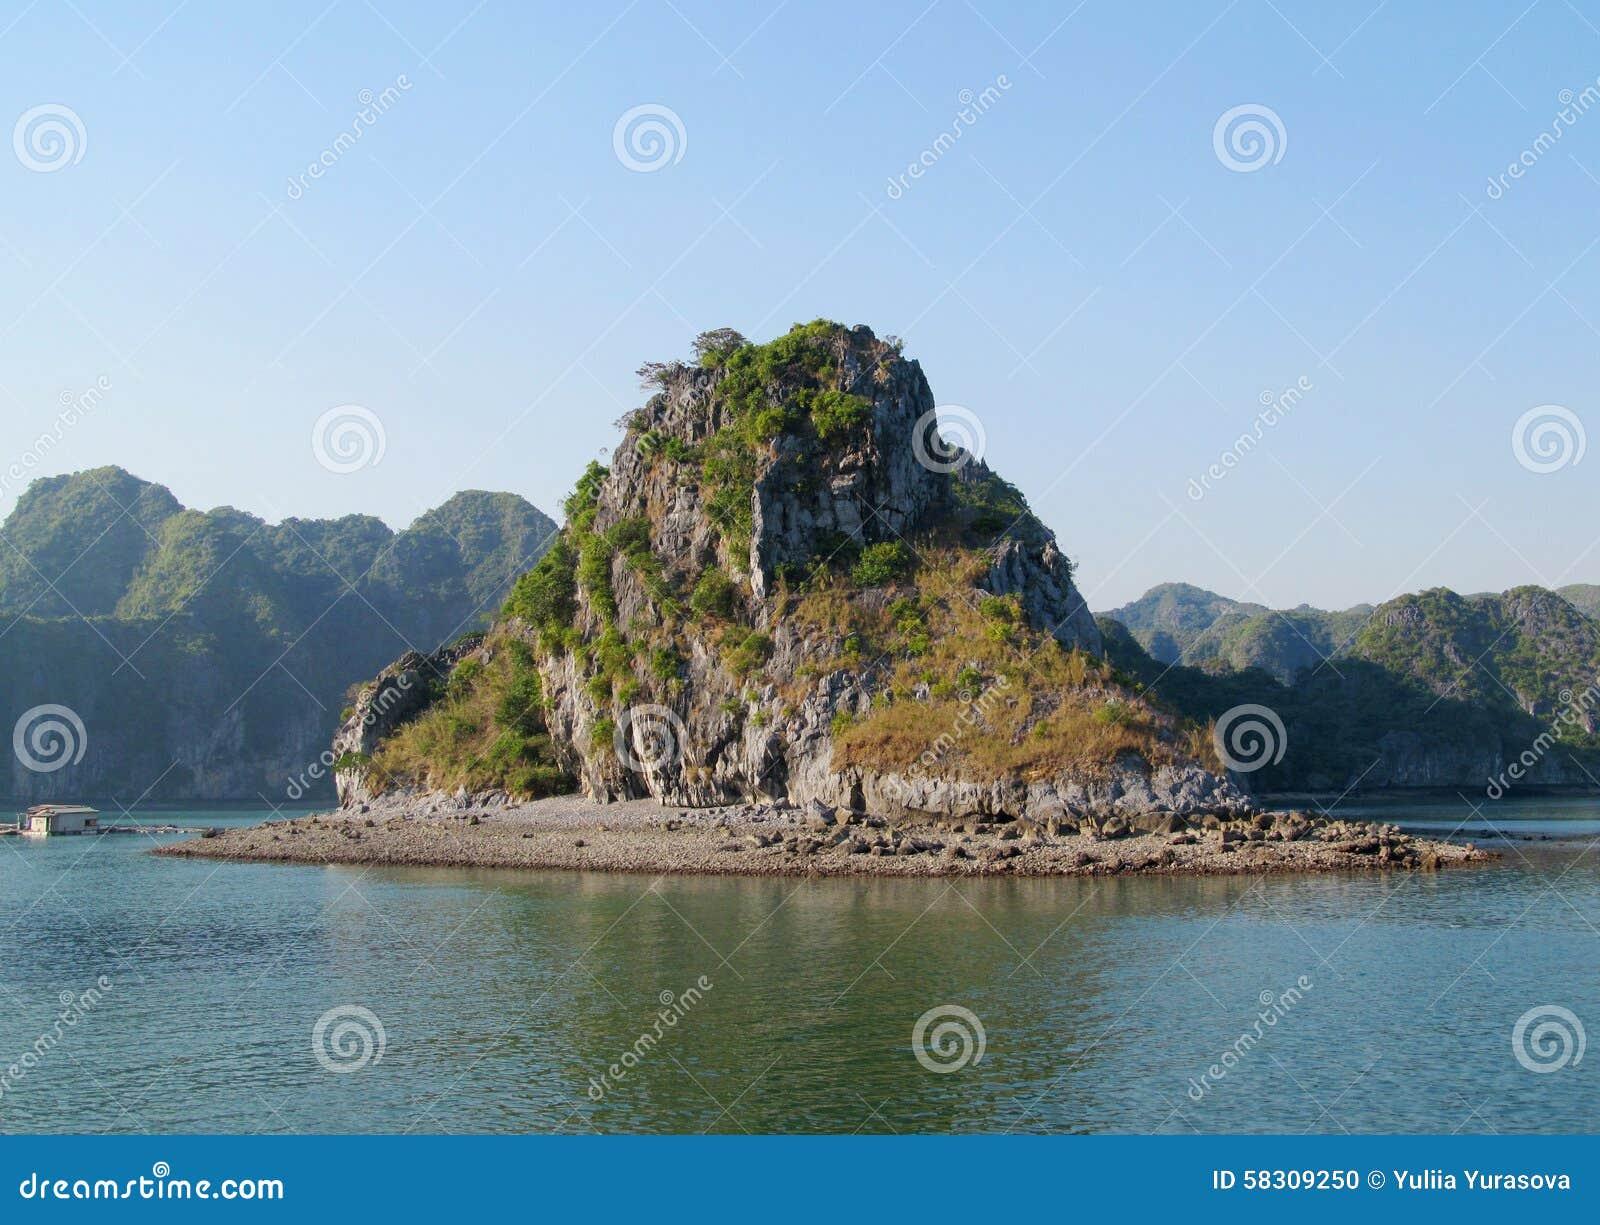 Limestone island in the sea bay